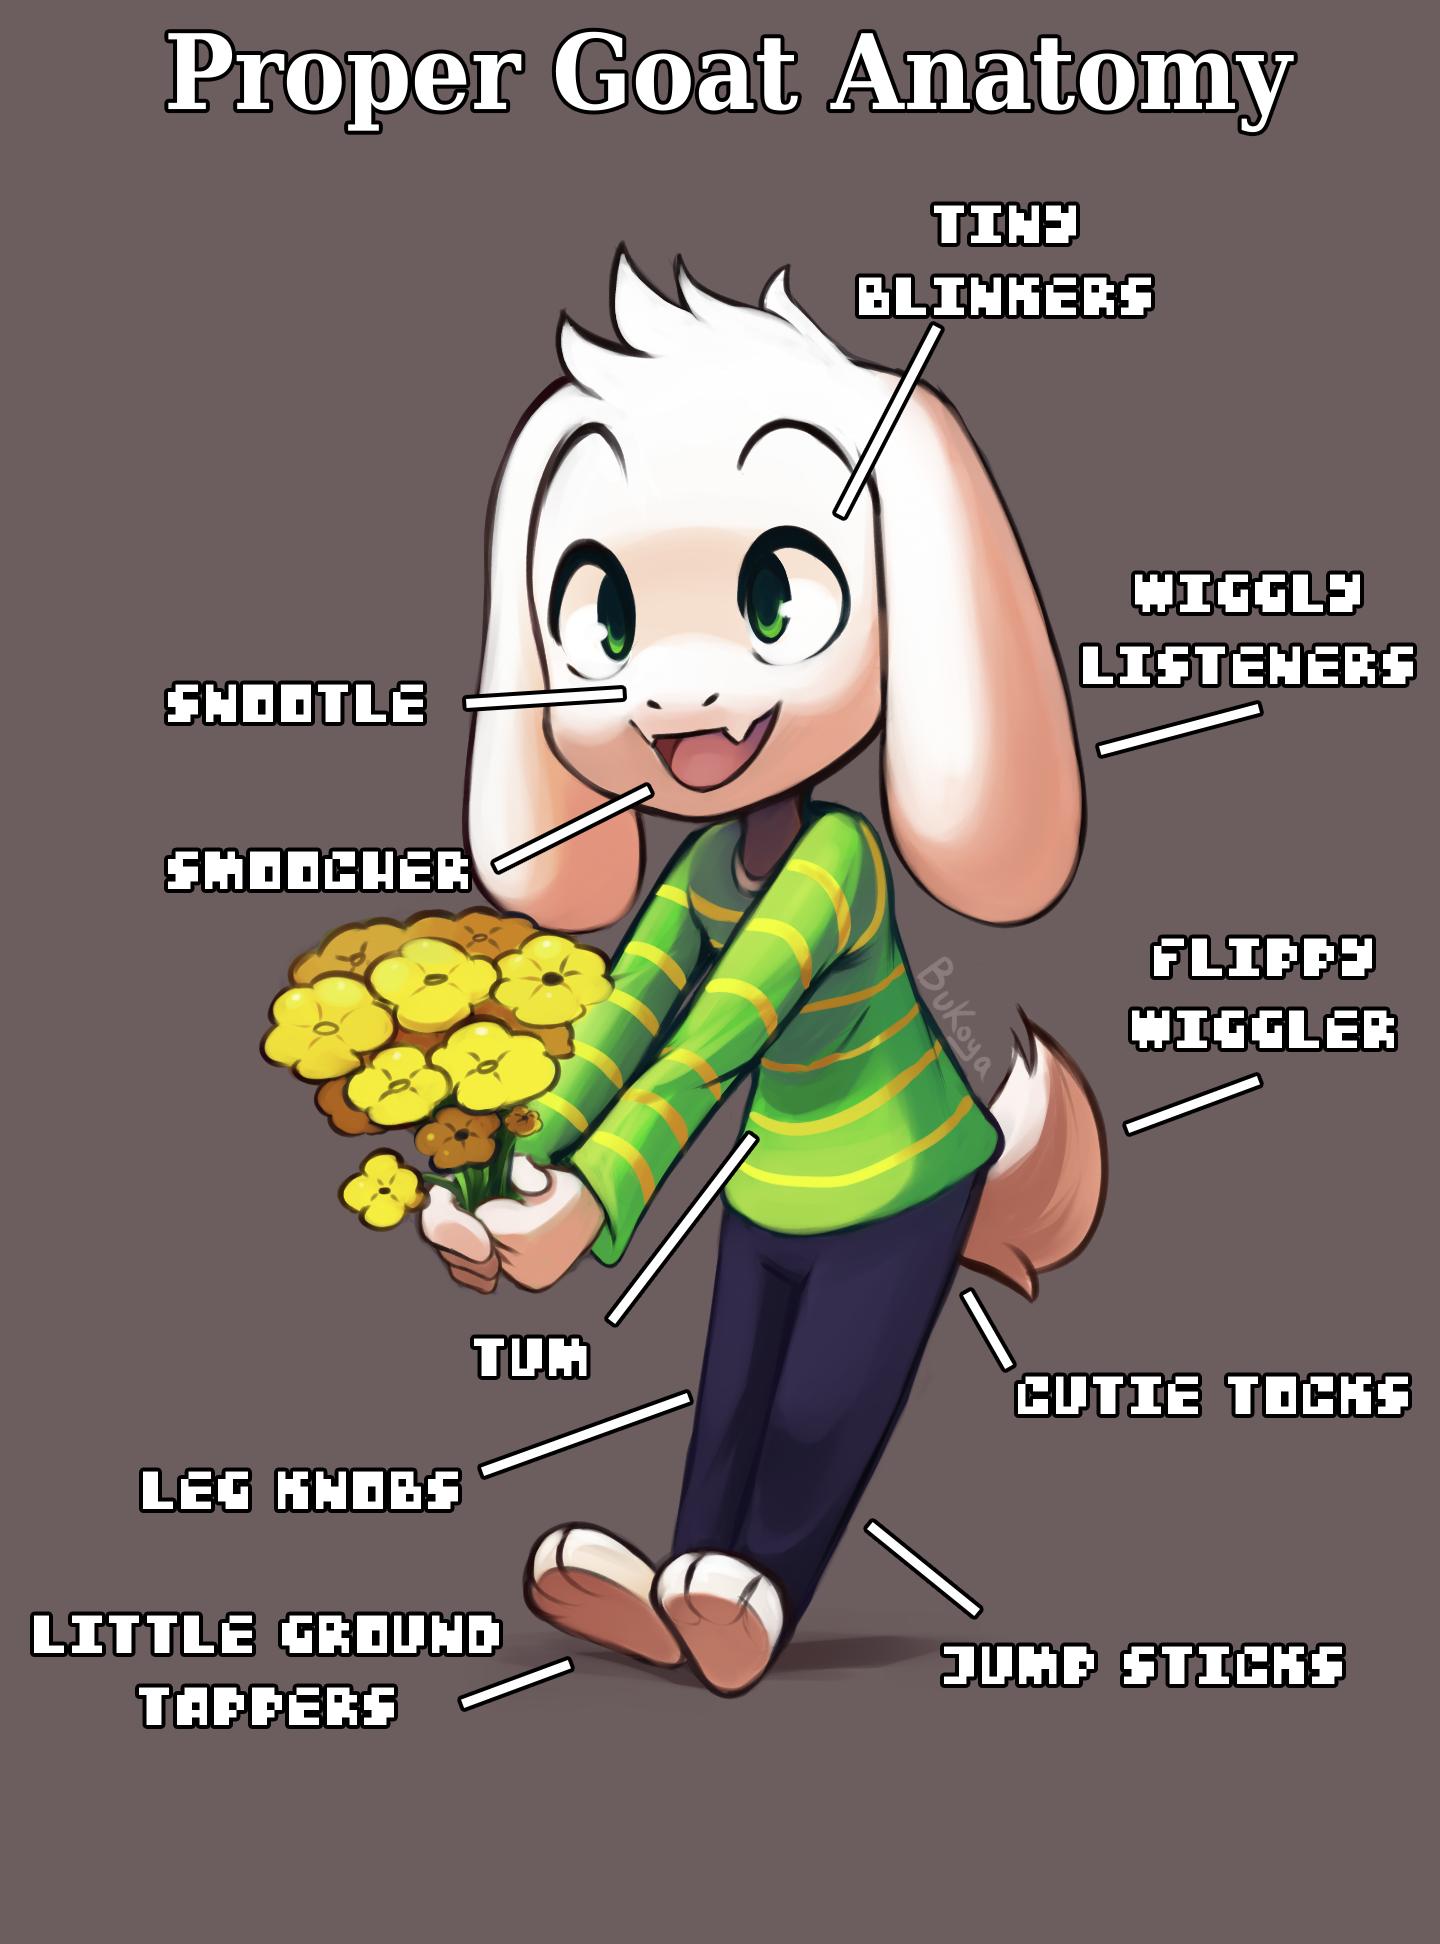 Proper Goat Anatomy Undertale Know Your Meme